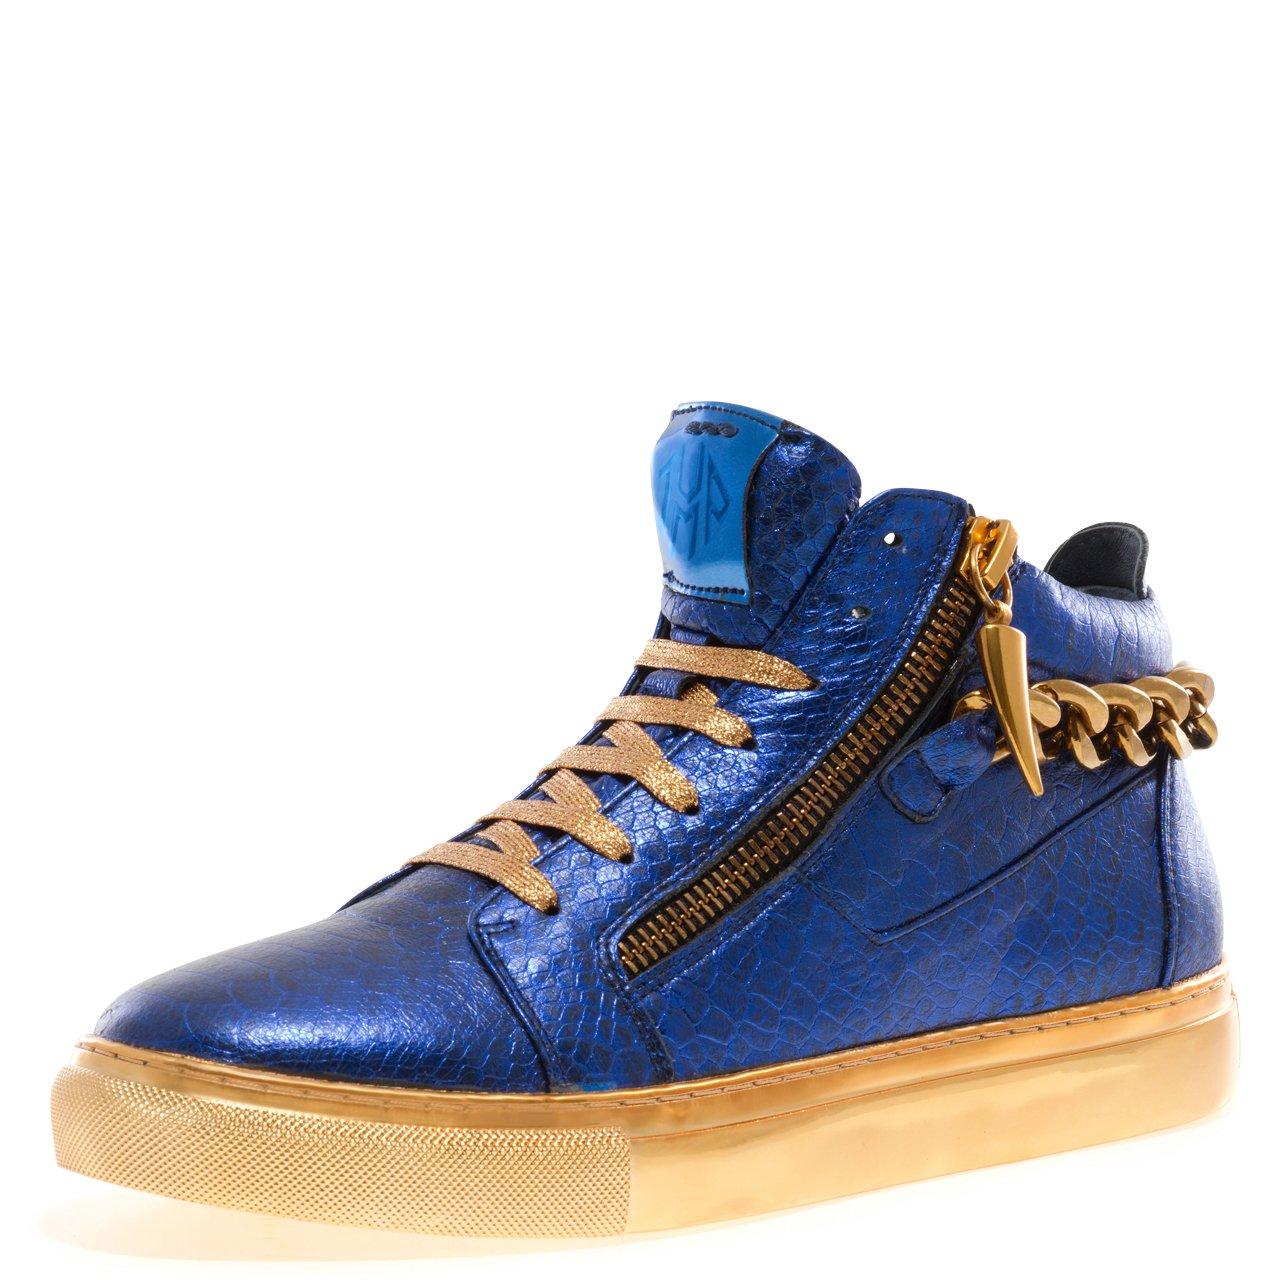 Jump J75 Men's Zack Chain Round Toe Rear Zipper Leather Lace-Up High-Top Sneaker Blue Reptile 8 D US Men